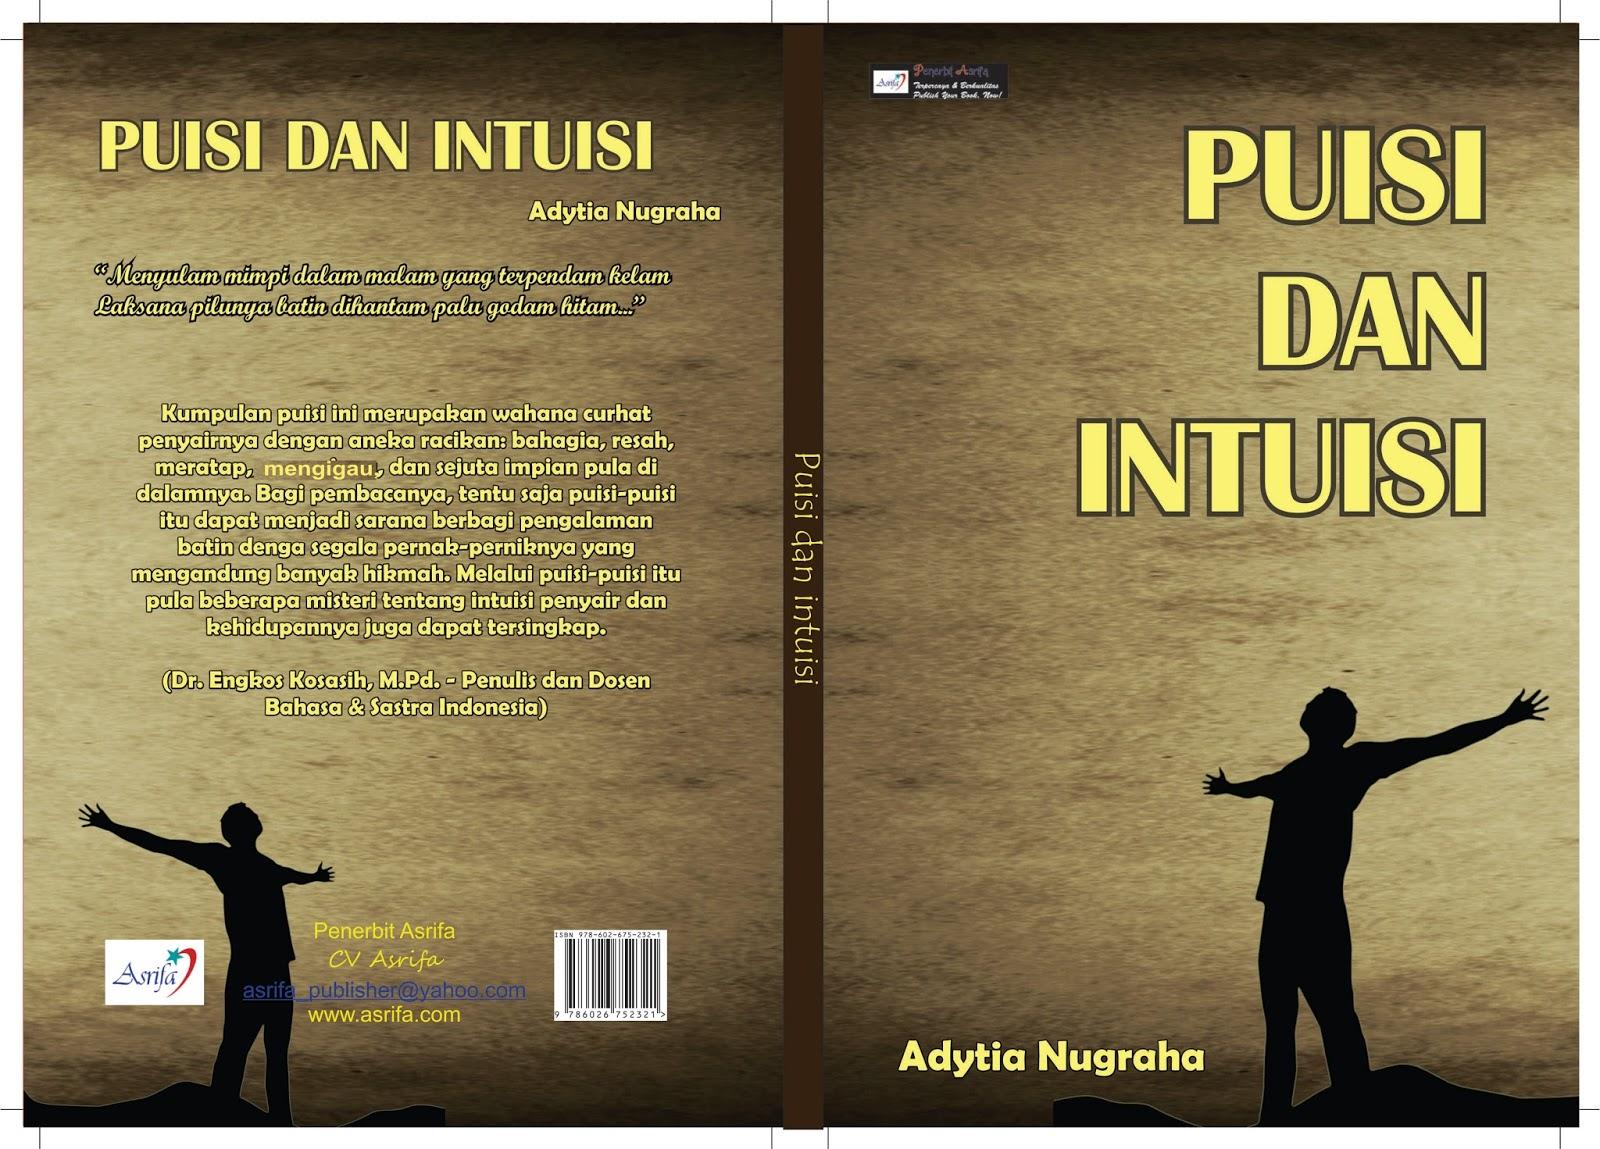 Judul Buku Puisi Dan Intuisi Kumpulan Puisi Penulis Adytia Nugraha Isbn    Jumlah Hal  Hlm Dimensi Buku X Cm Harga Buku